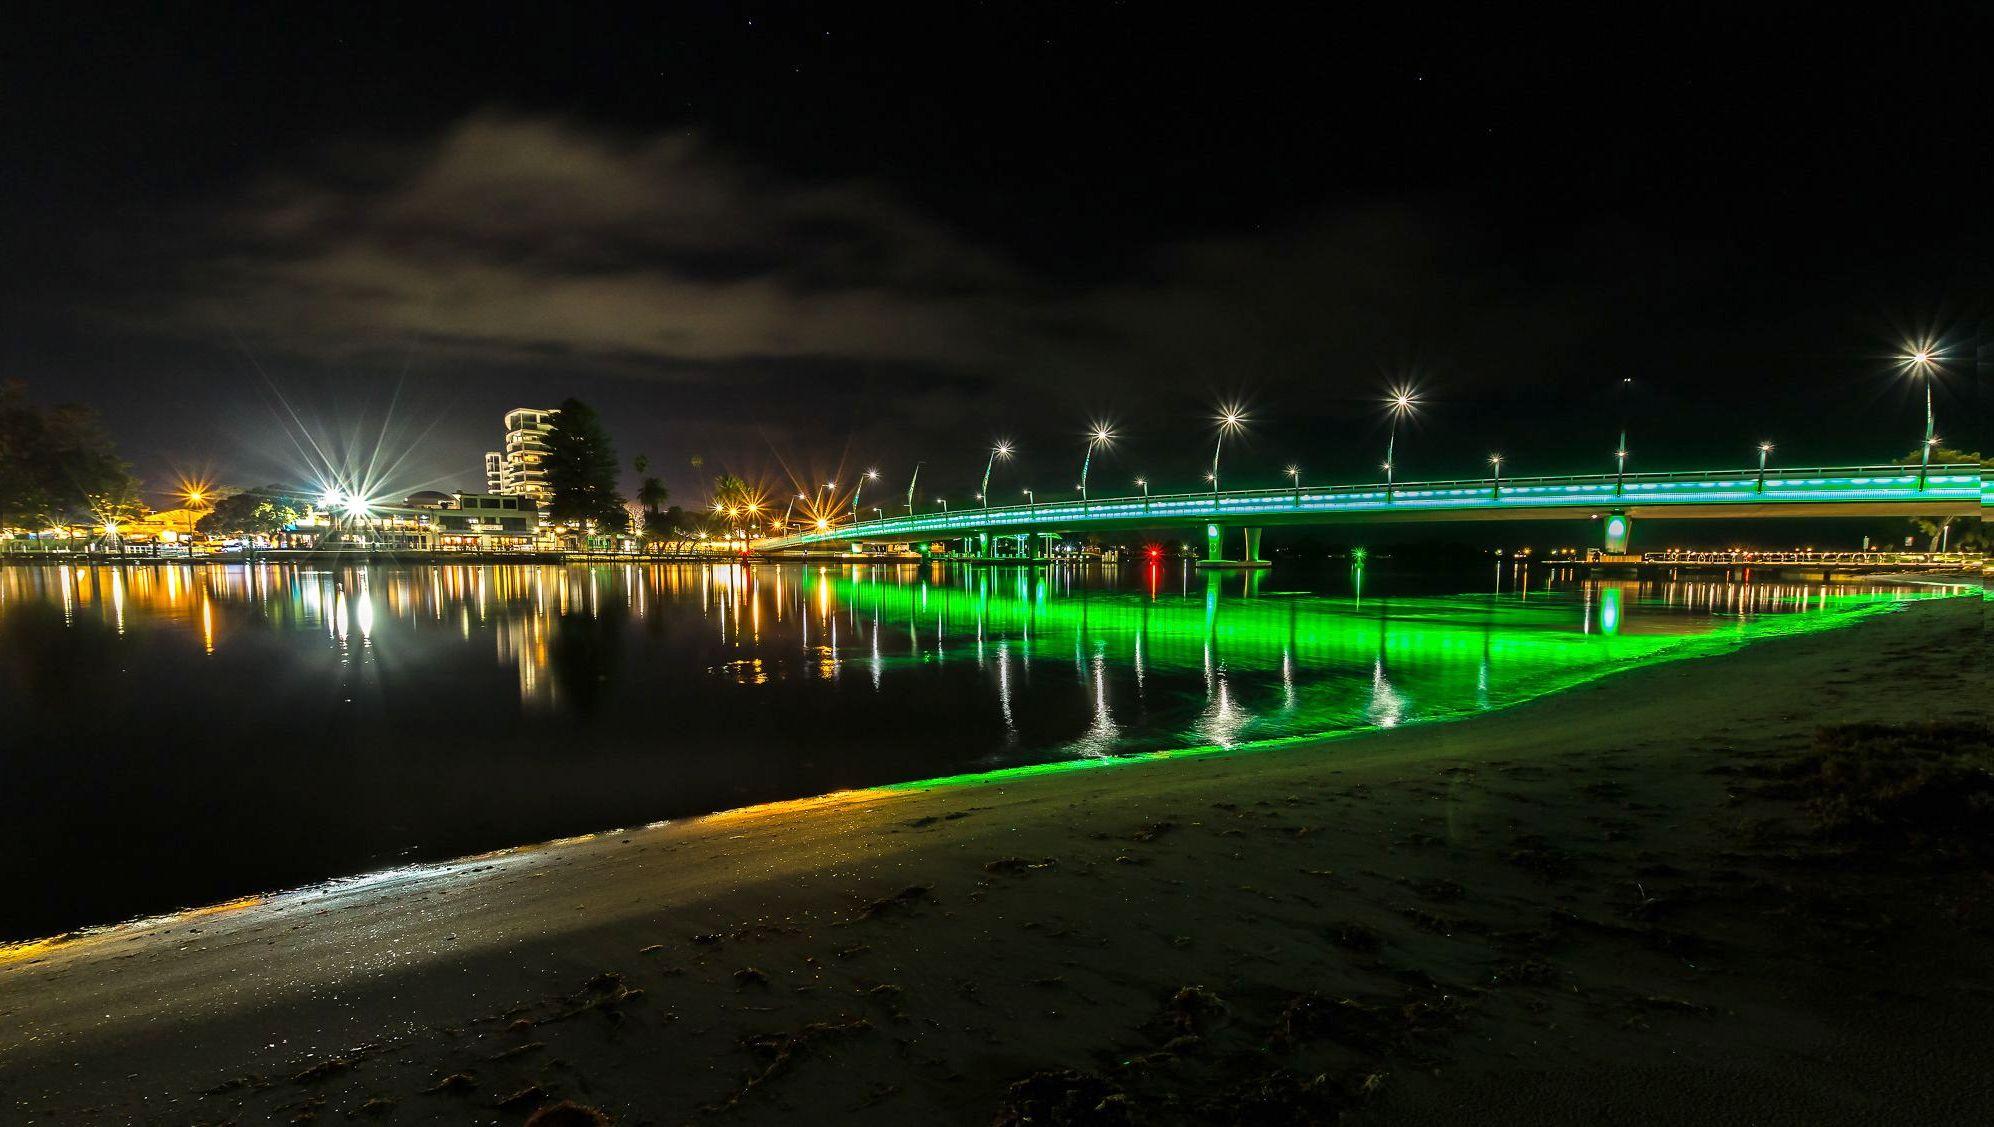 Mandurah bridge lights